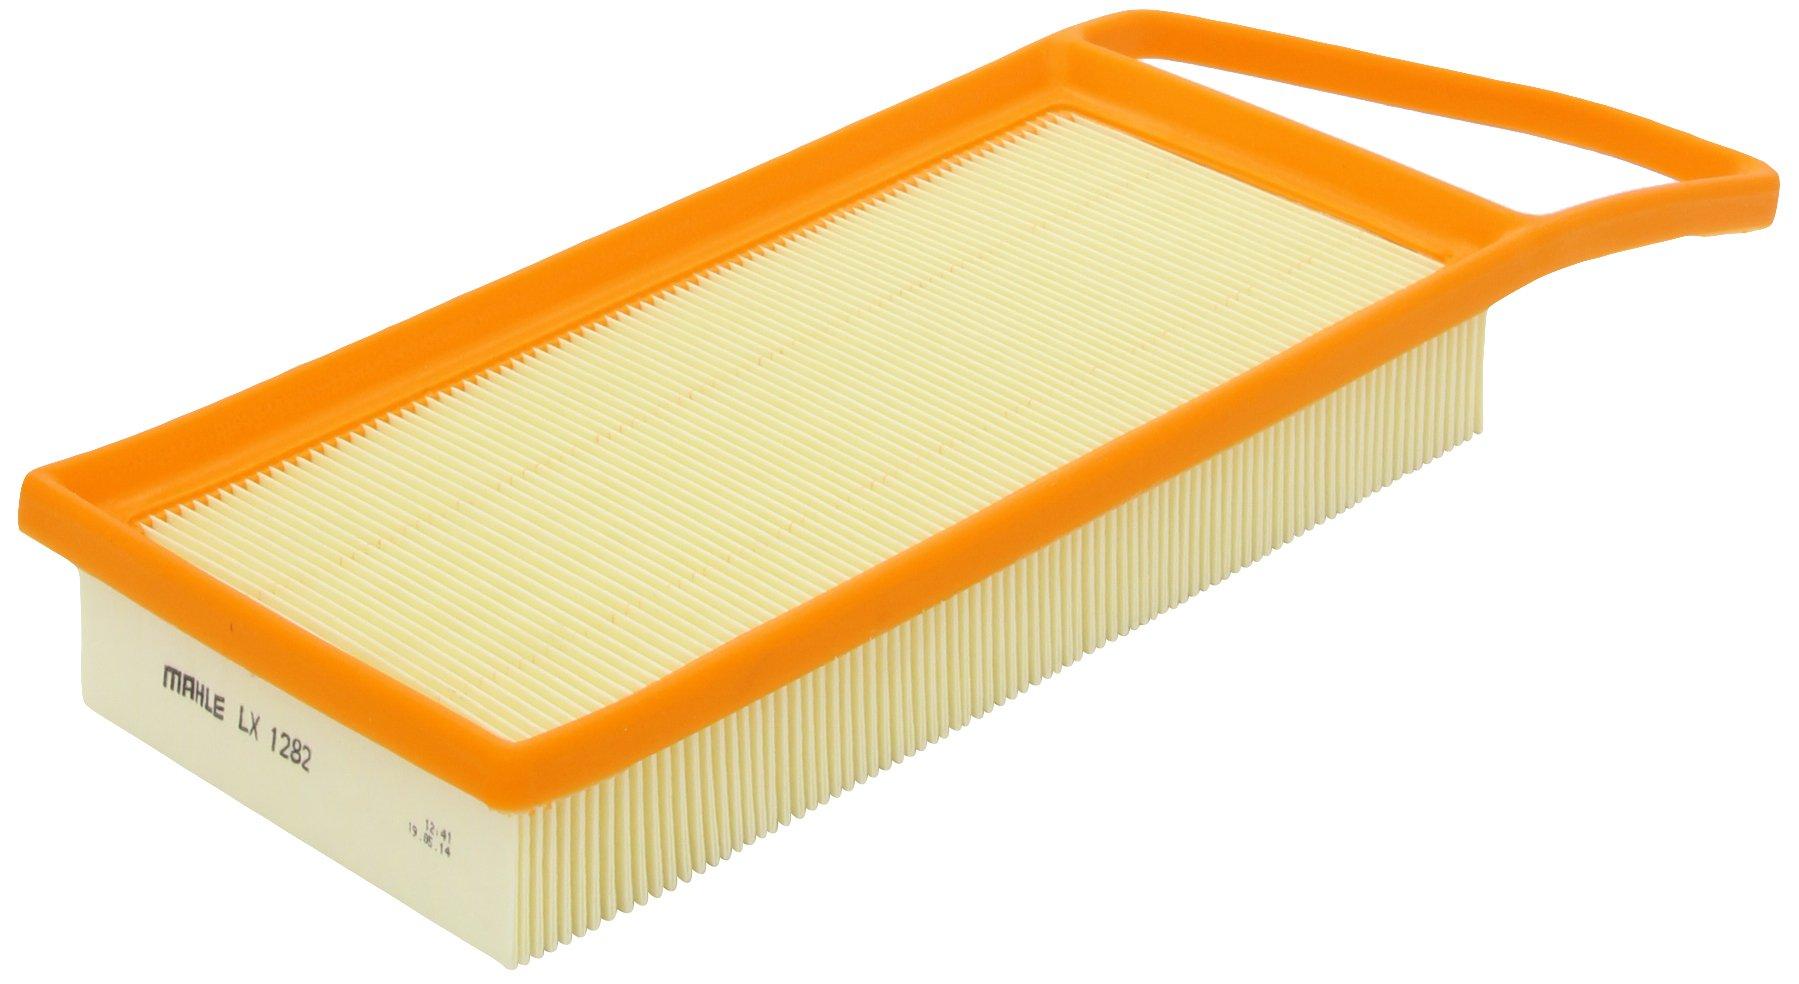 Mahle Filter LX1282 Filtro De Aire product image